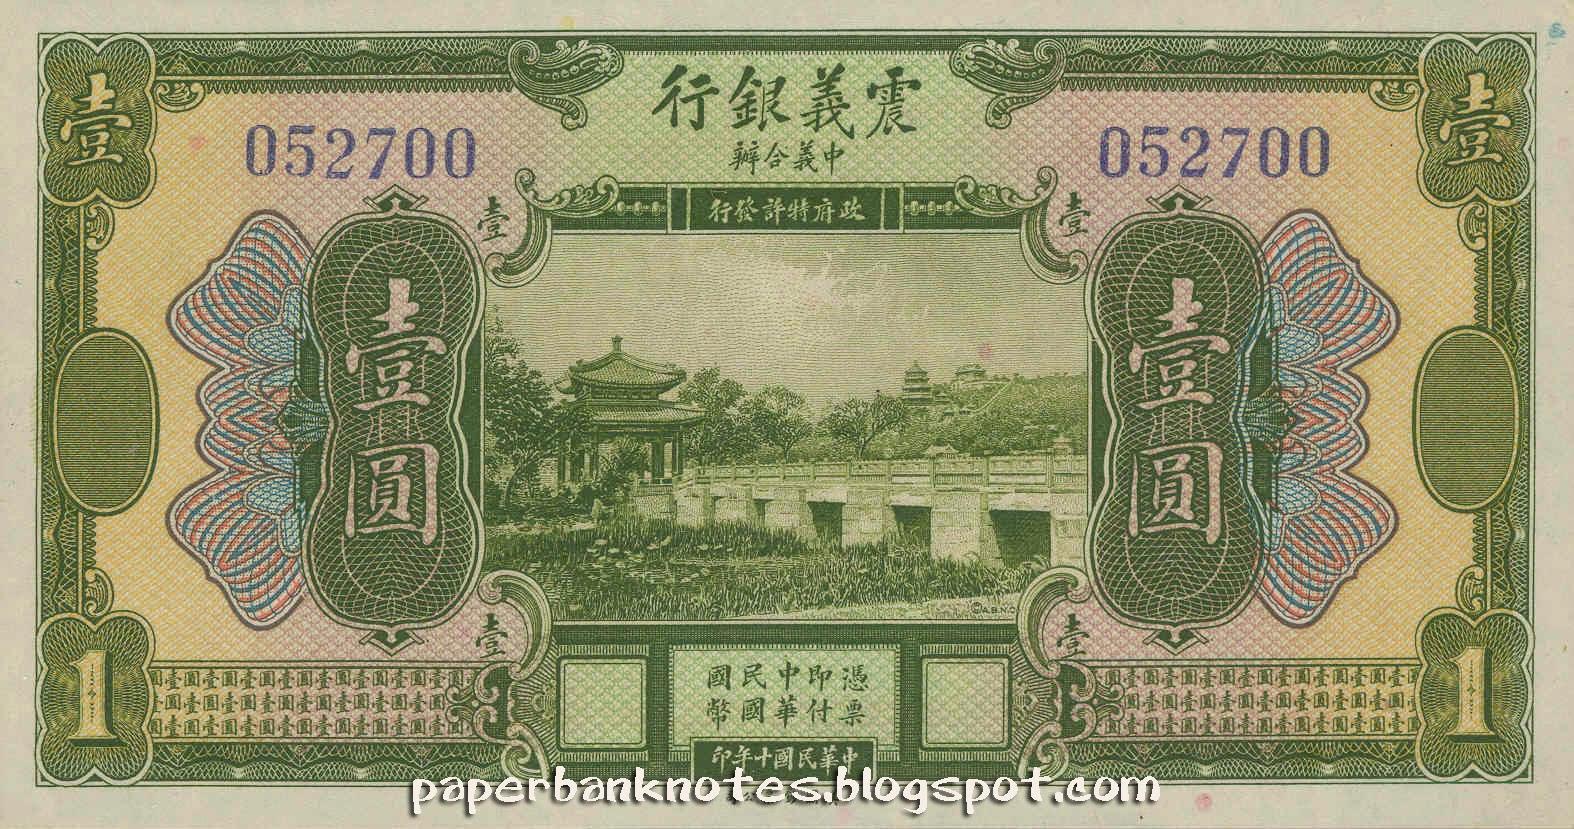 http://eastasiabanknotes.blogspot.com/2014/04/china-chinese-italian-banking.html